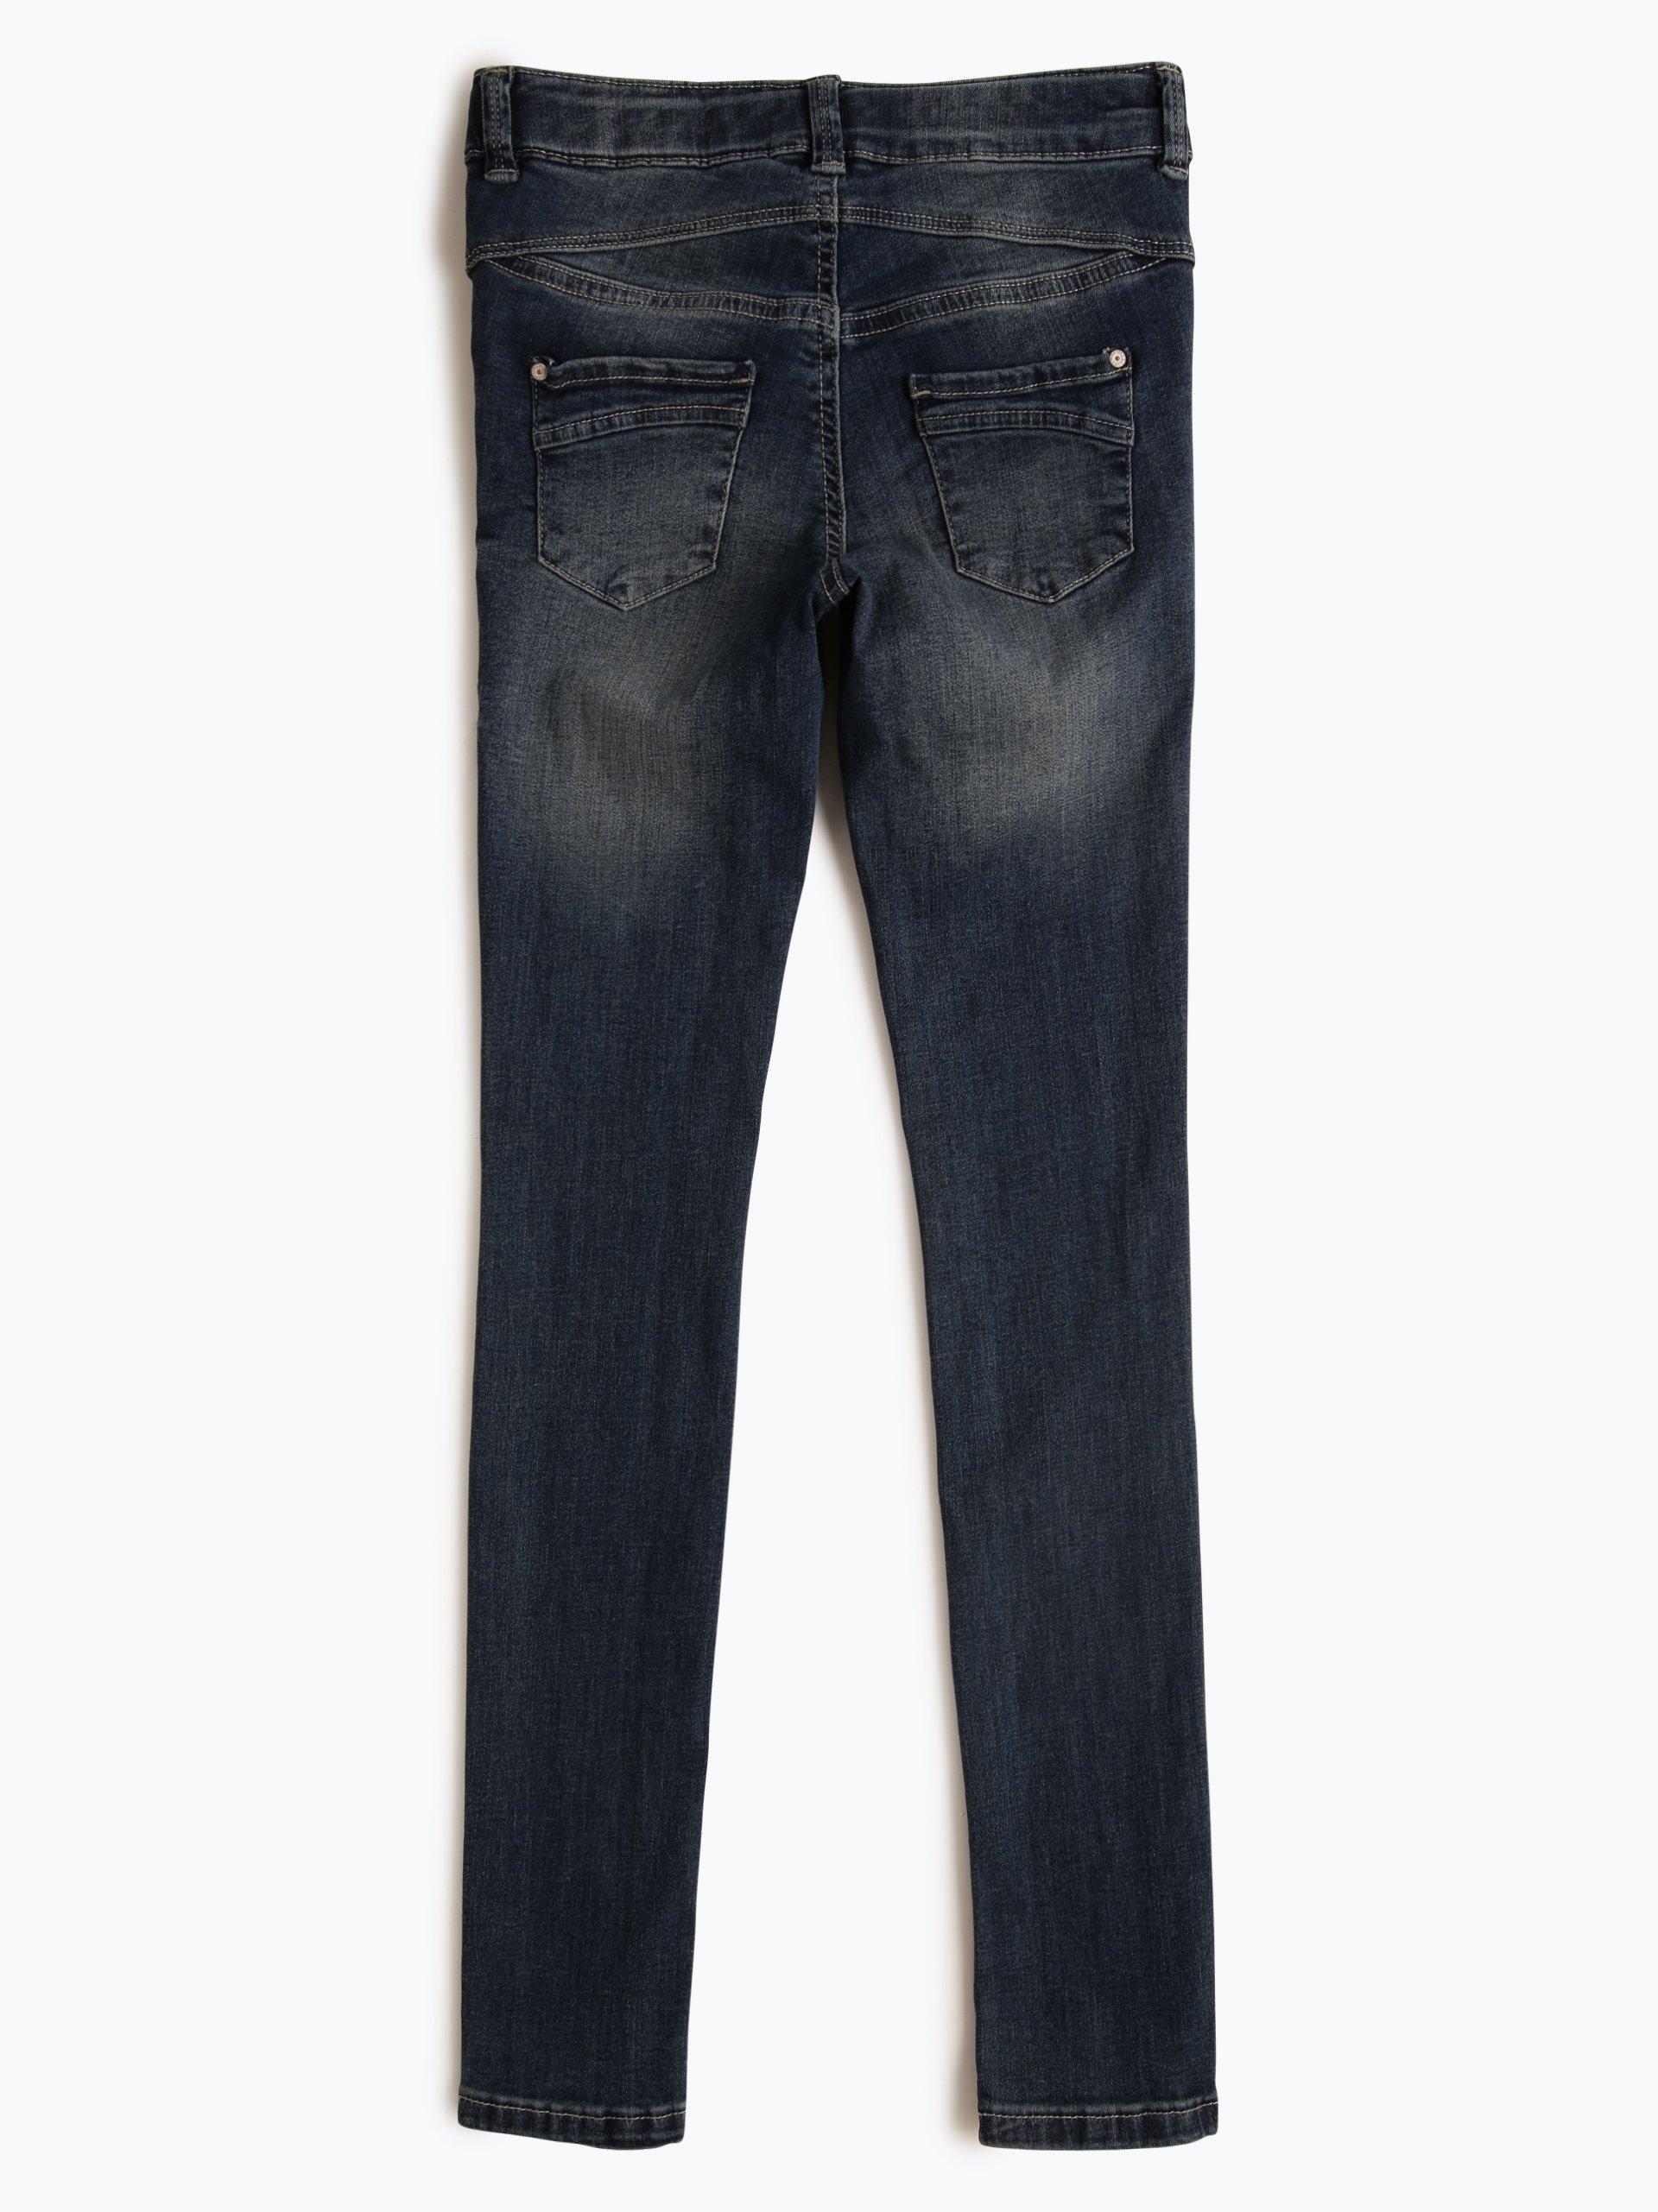 Tom Tailor Mädchen Jeans Comfy Fit - Lissie